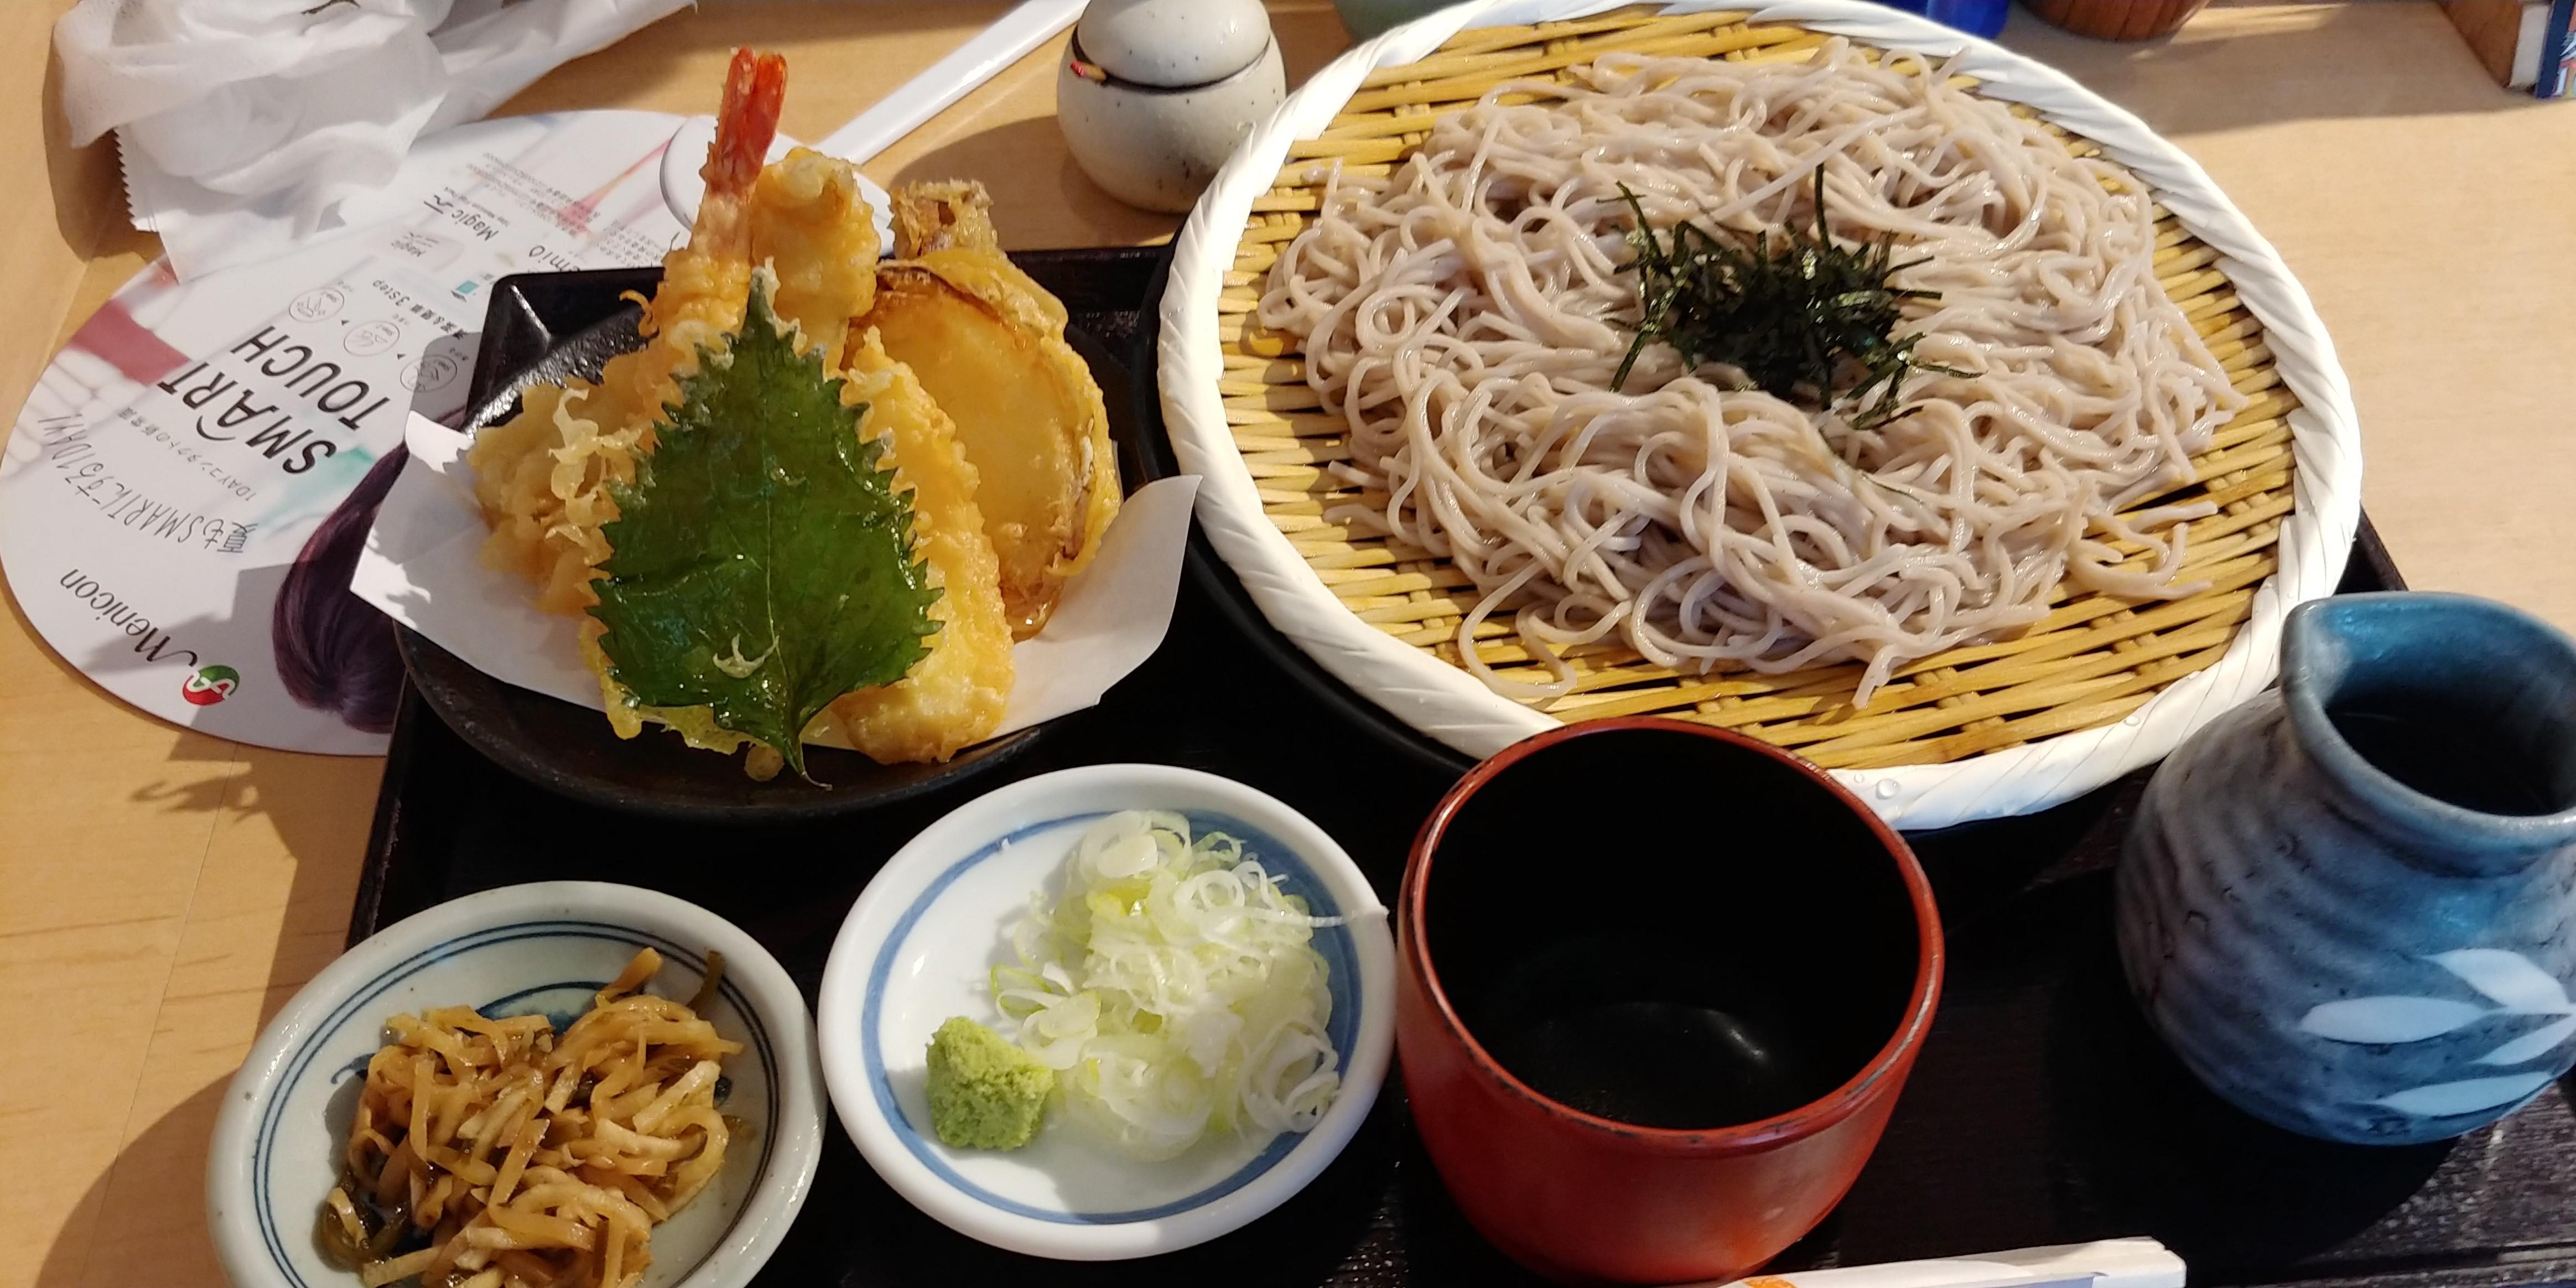 f:id:kishuji-kaisoku:20190801233554j:image